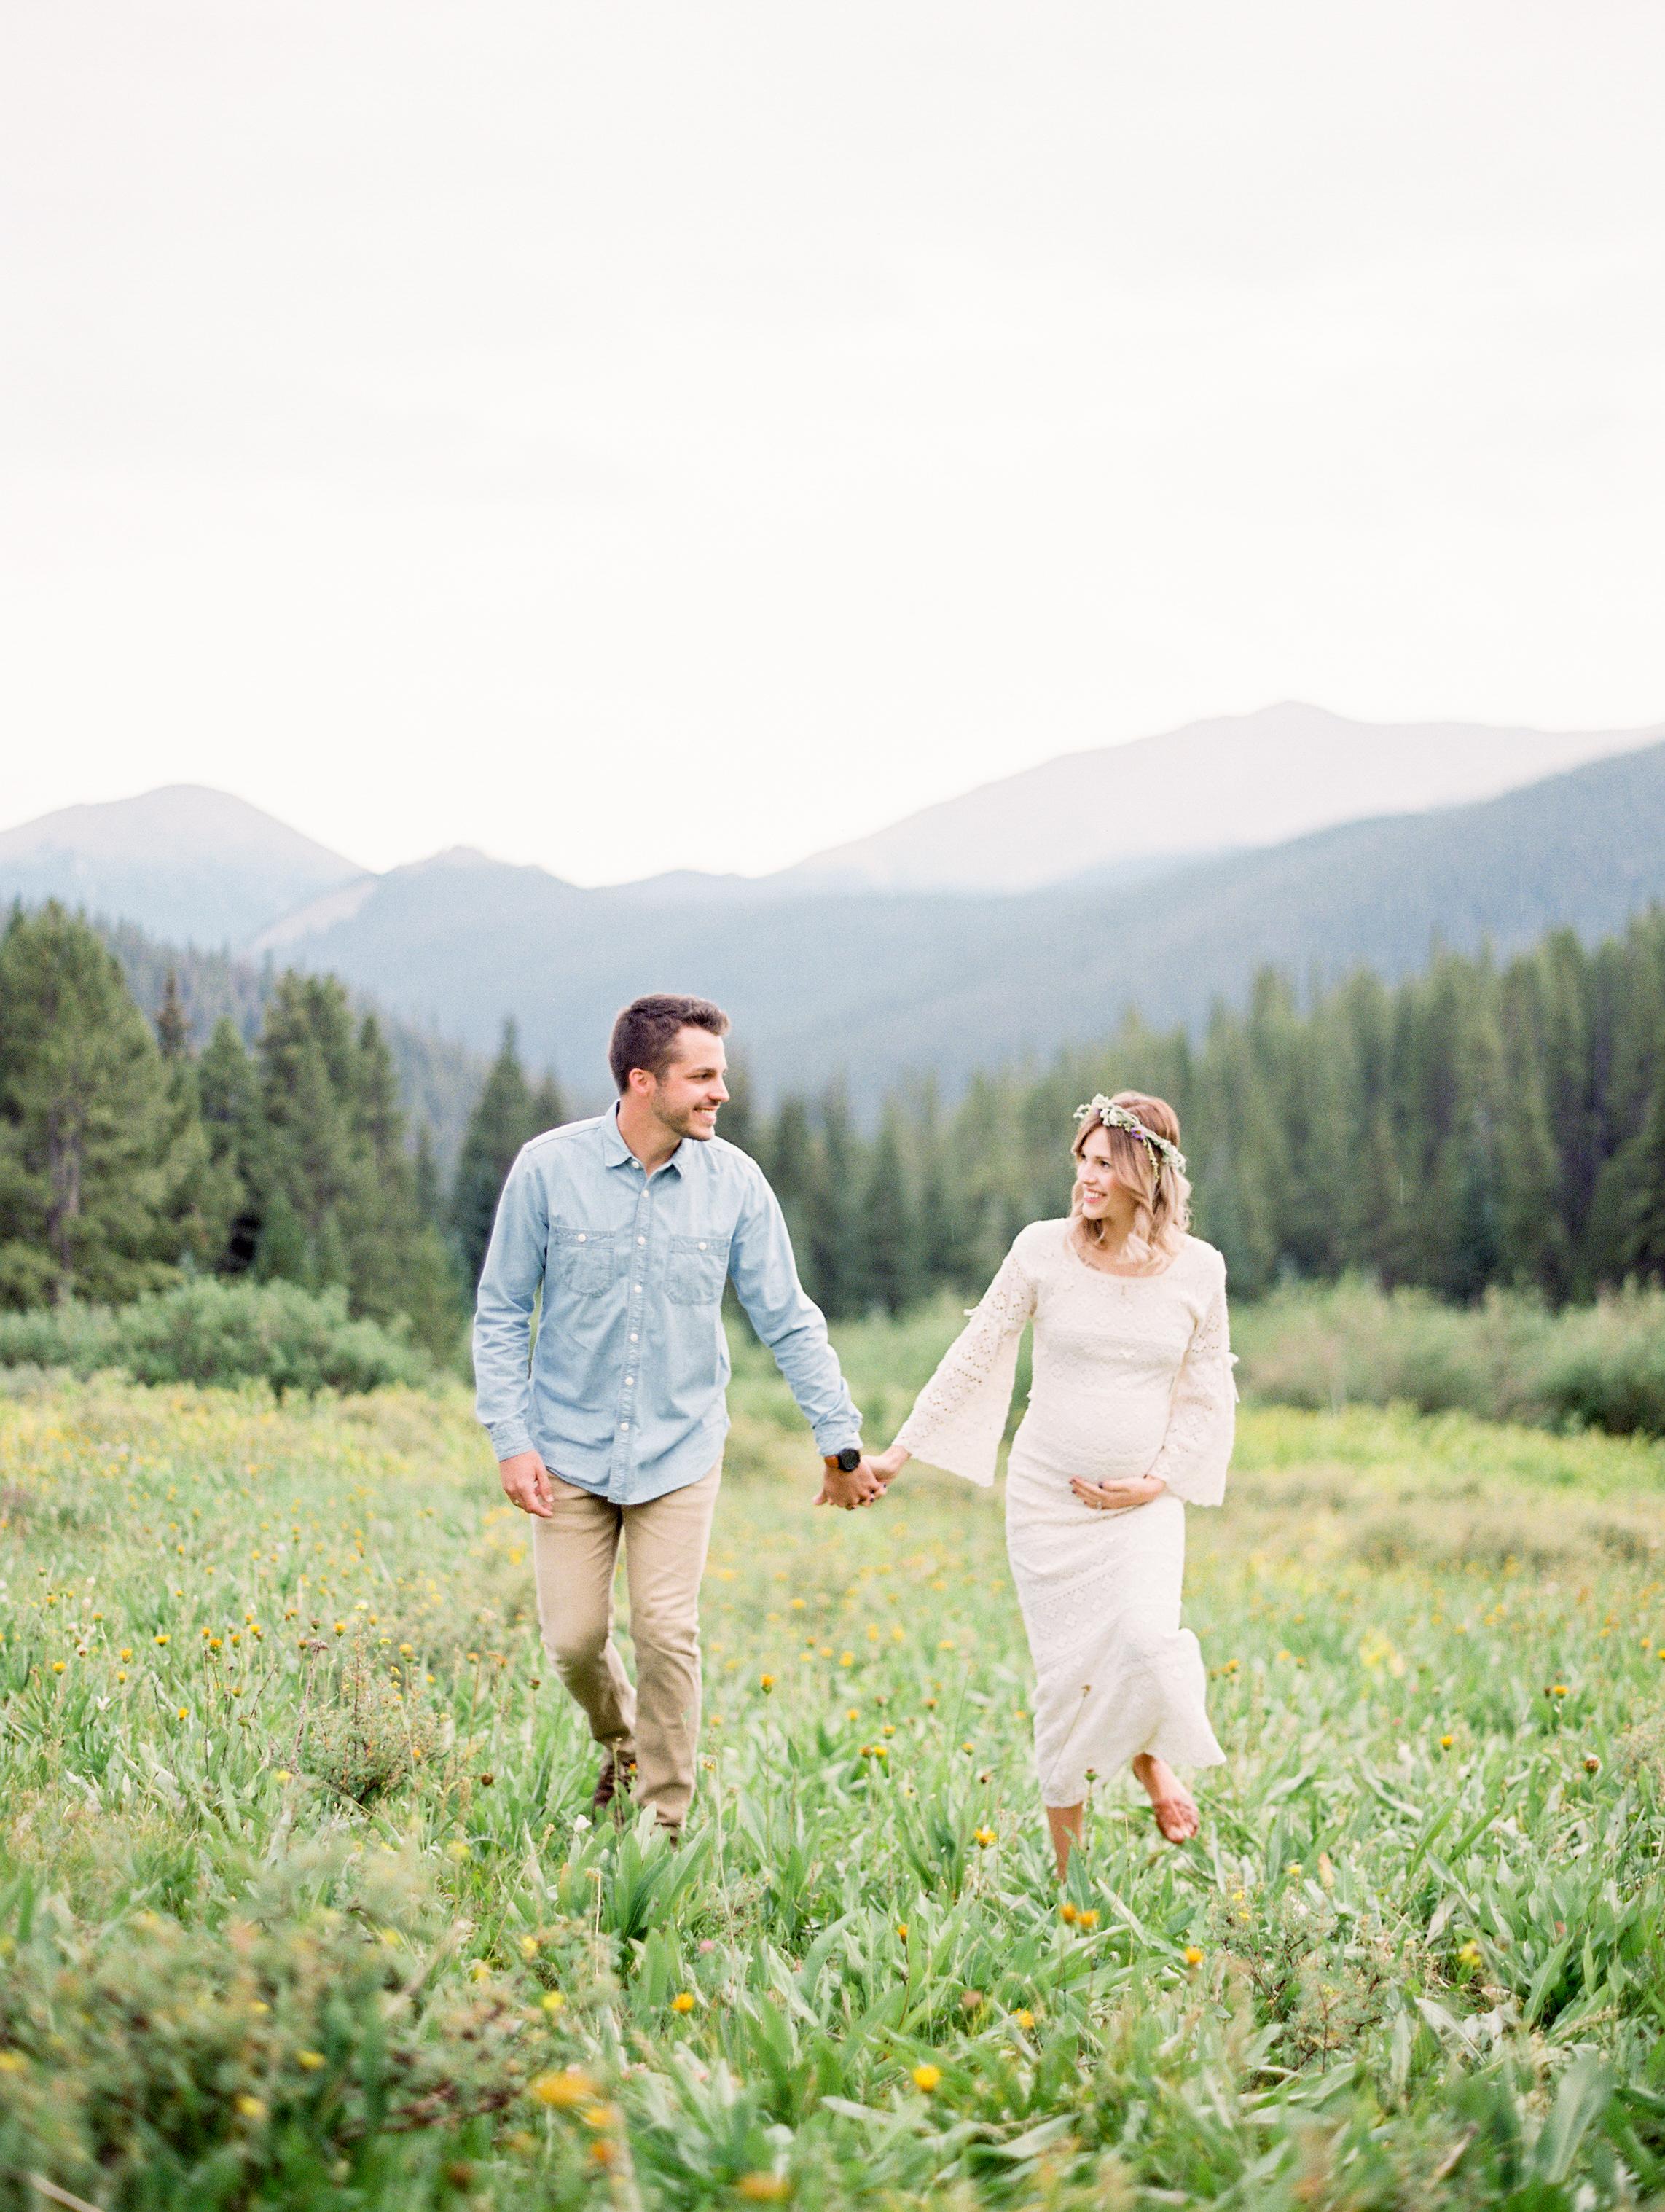 Dani-Cowan-Photography-Colorado-Film-Photographer-Breckenridge-SampriMaternity63 copy.JPG